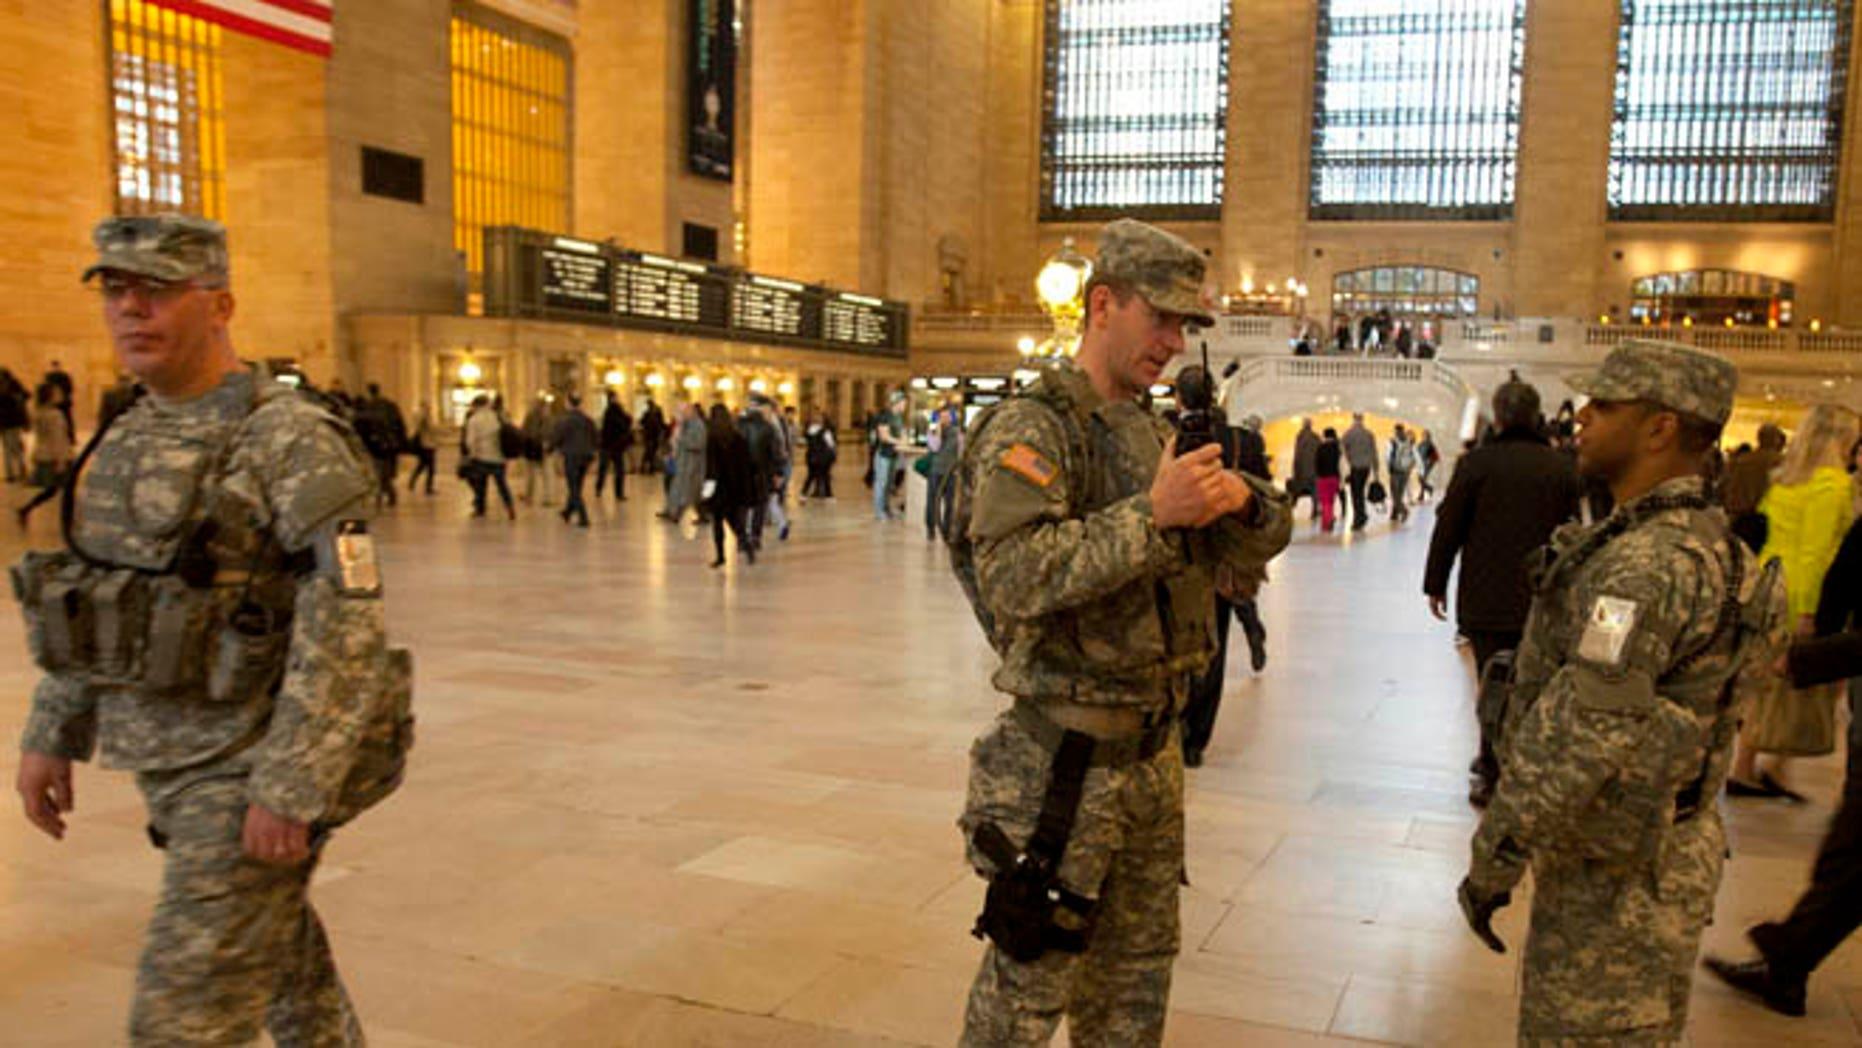 FILE: Army National Guard members patrol Grand Central Terminal, in New York, N.Y.